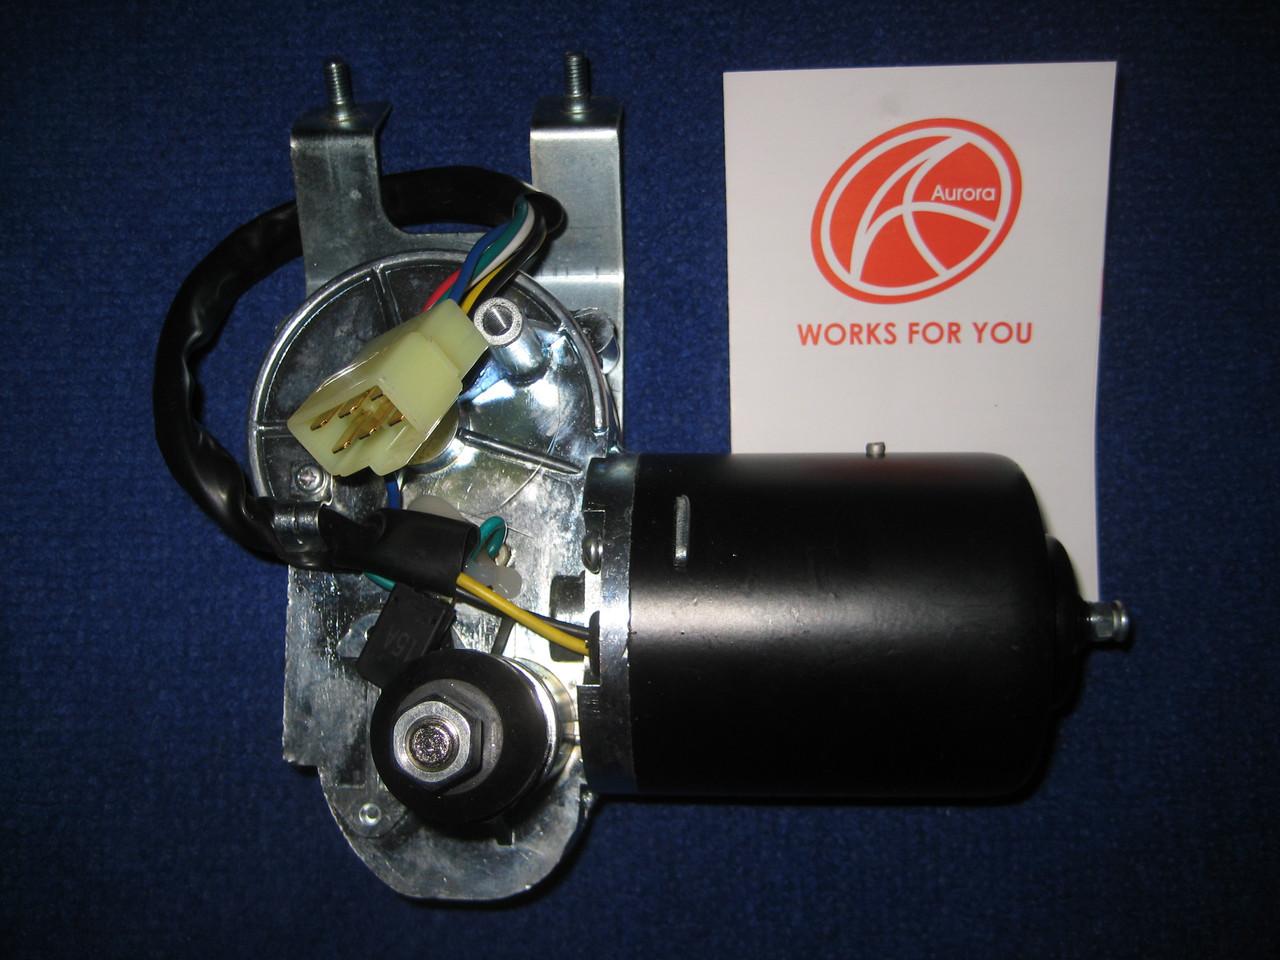 Мотор моторчик электродвигатель дворников моторредуктор передний Таврия Славута ЗАЗ 1102 1103 1105 Аврора